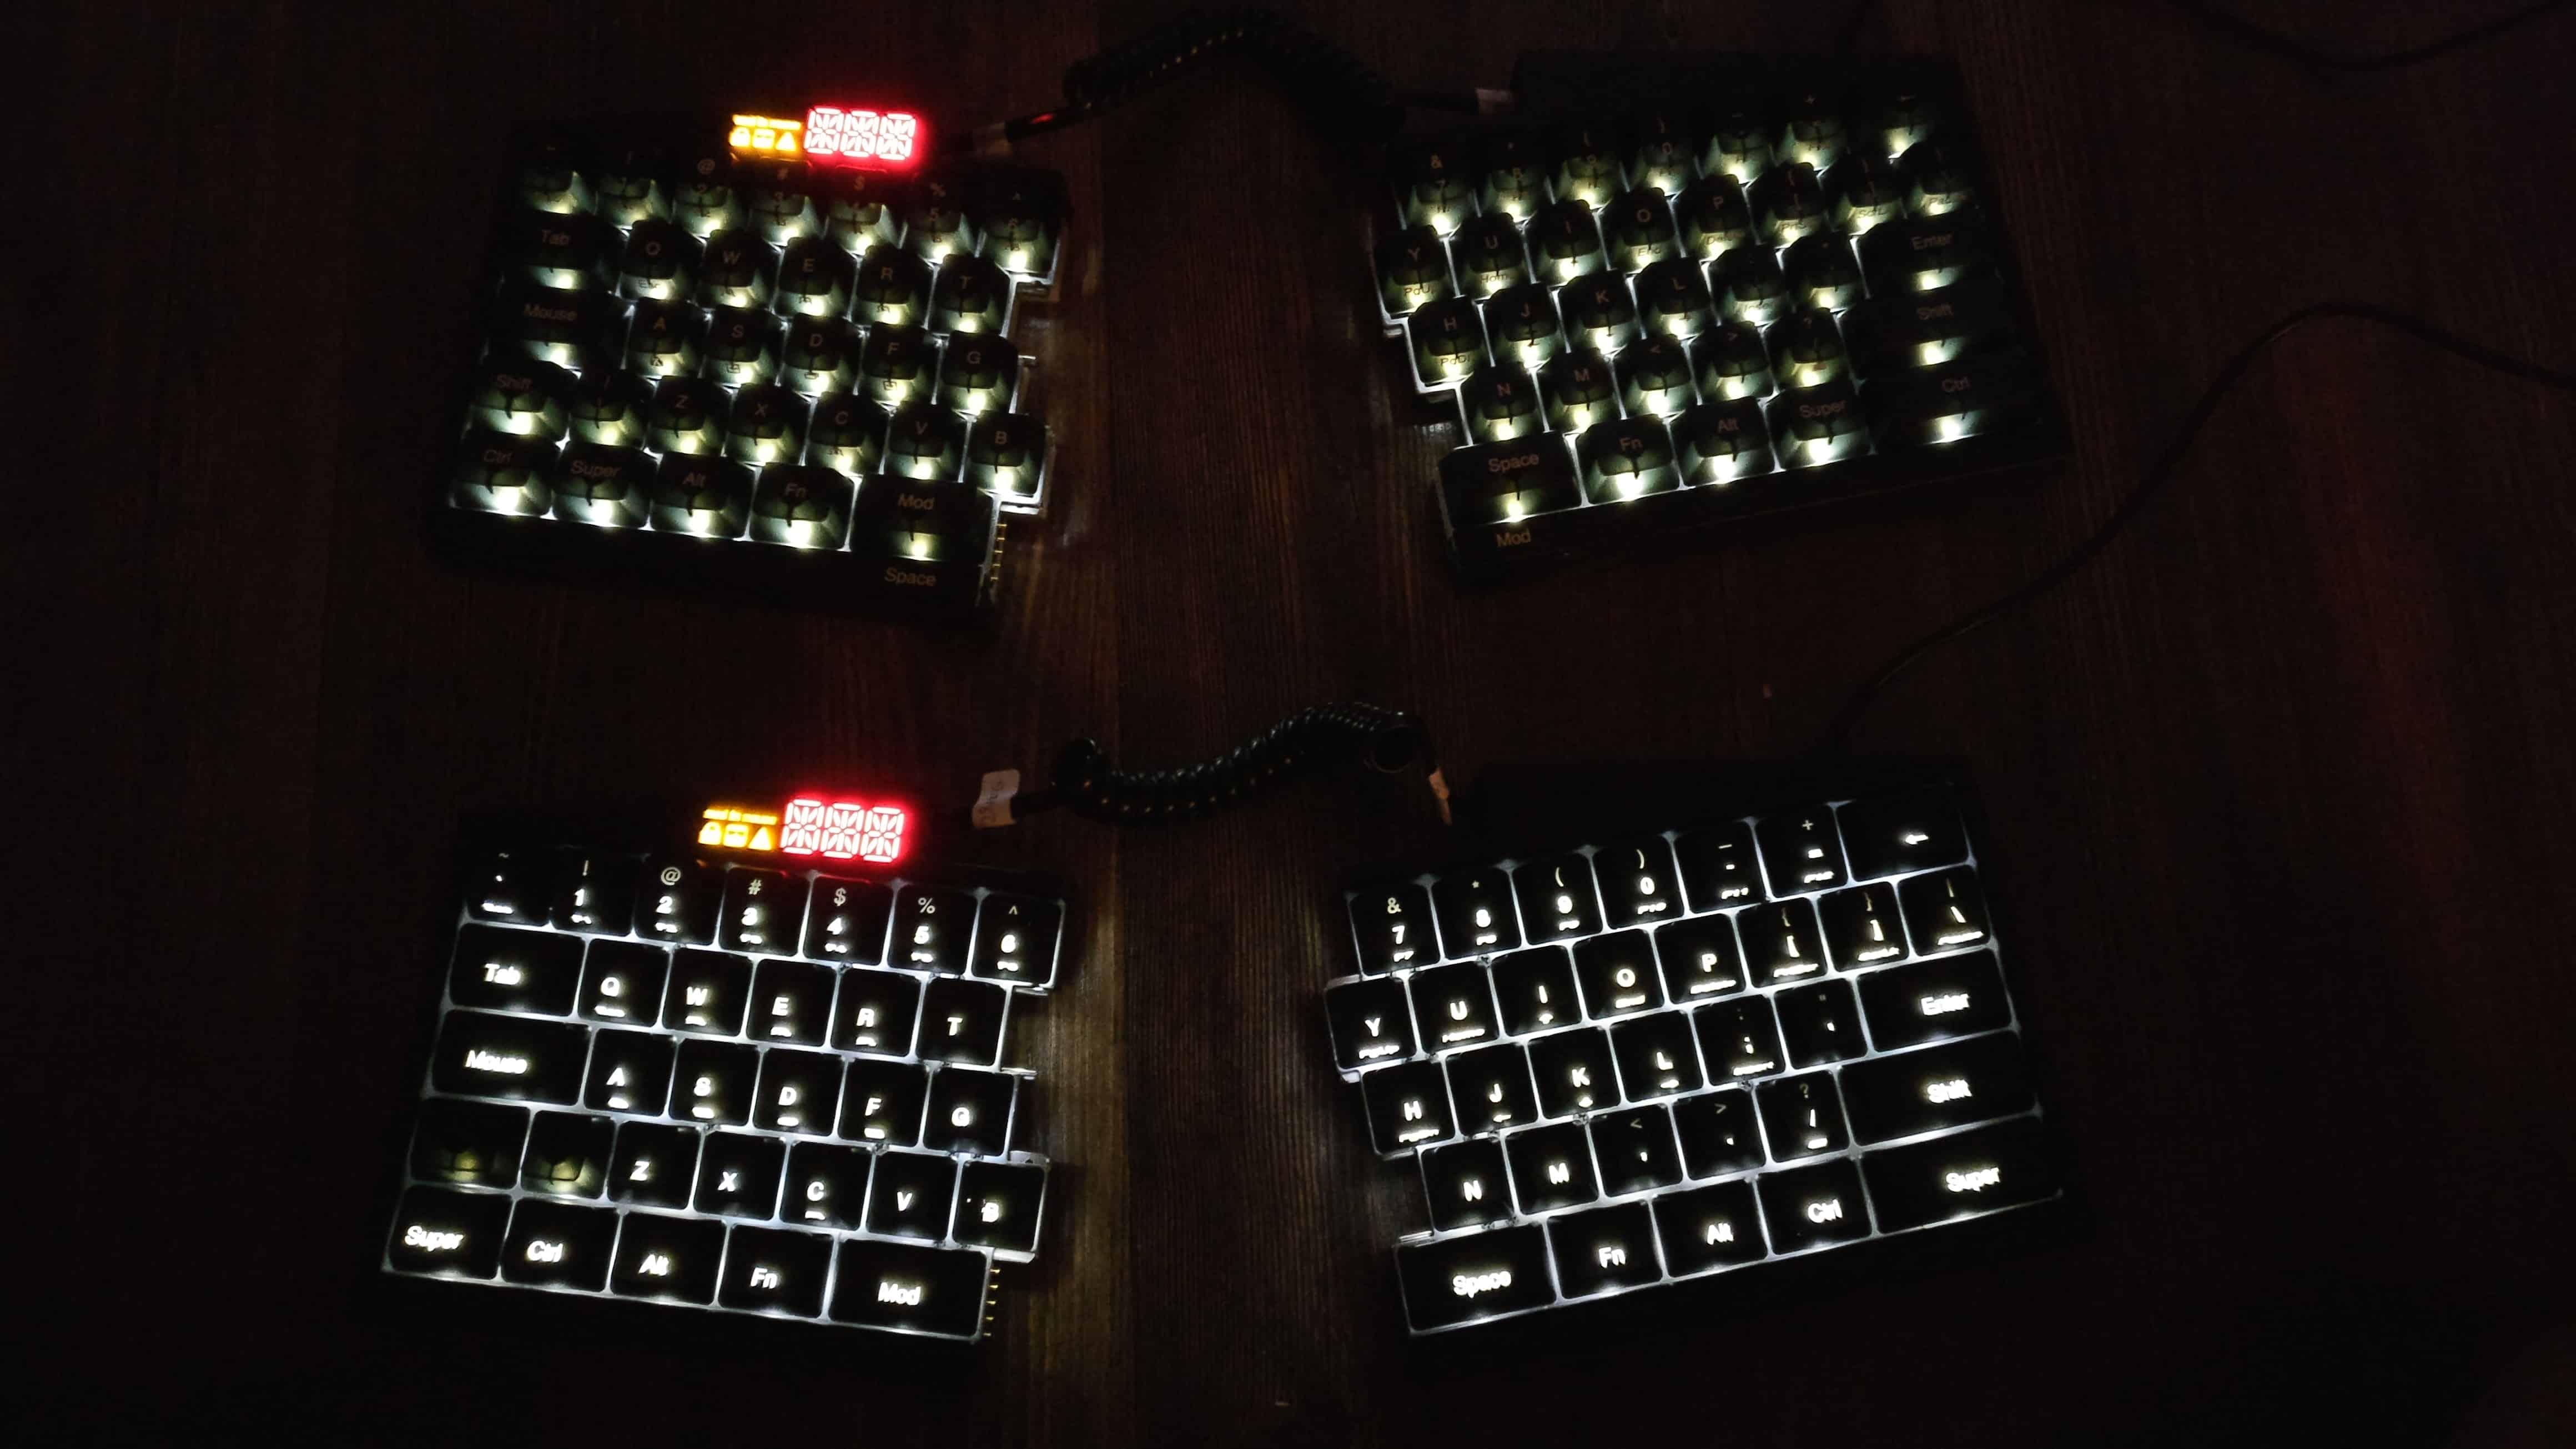 Features Ultimate Hacking Keyboard Light Wiring Diagram Backlit Uhk Prototypes At Night